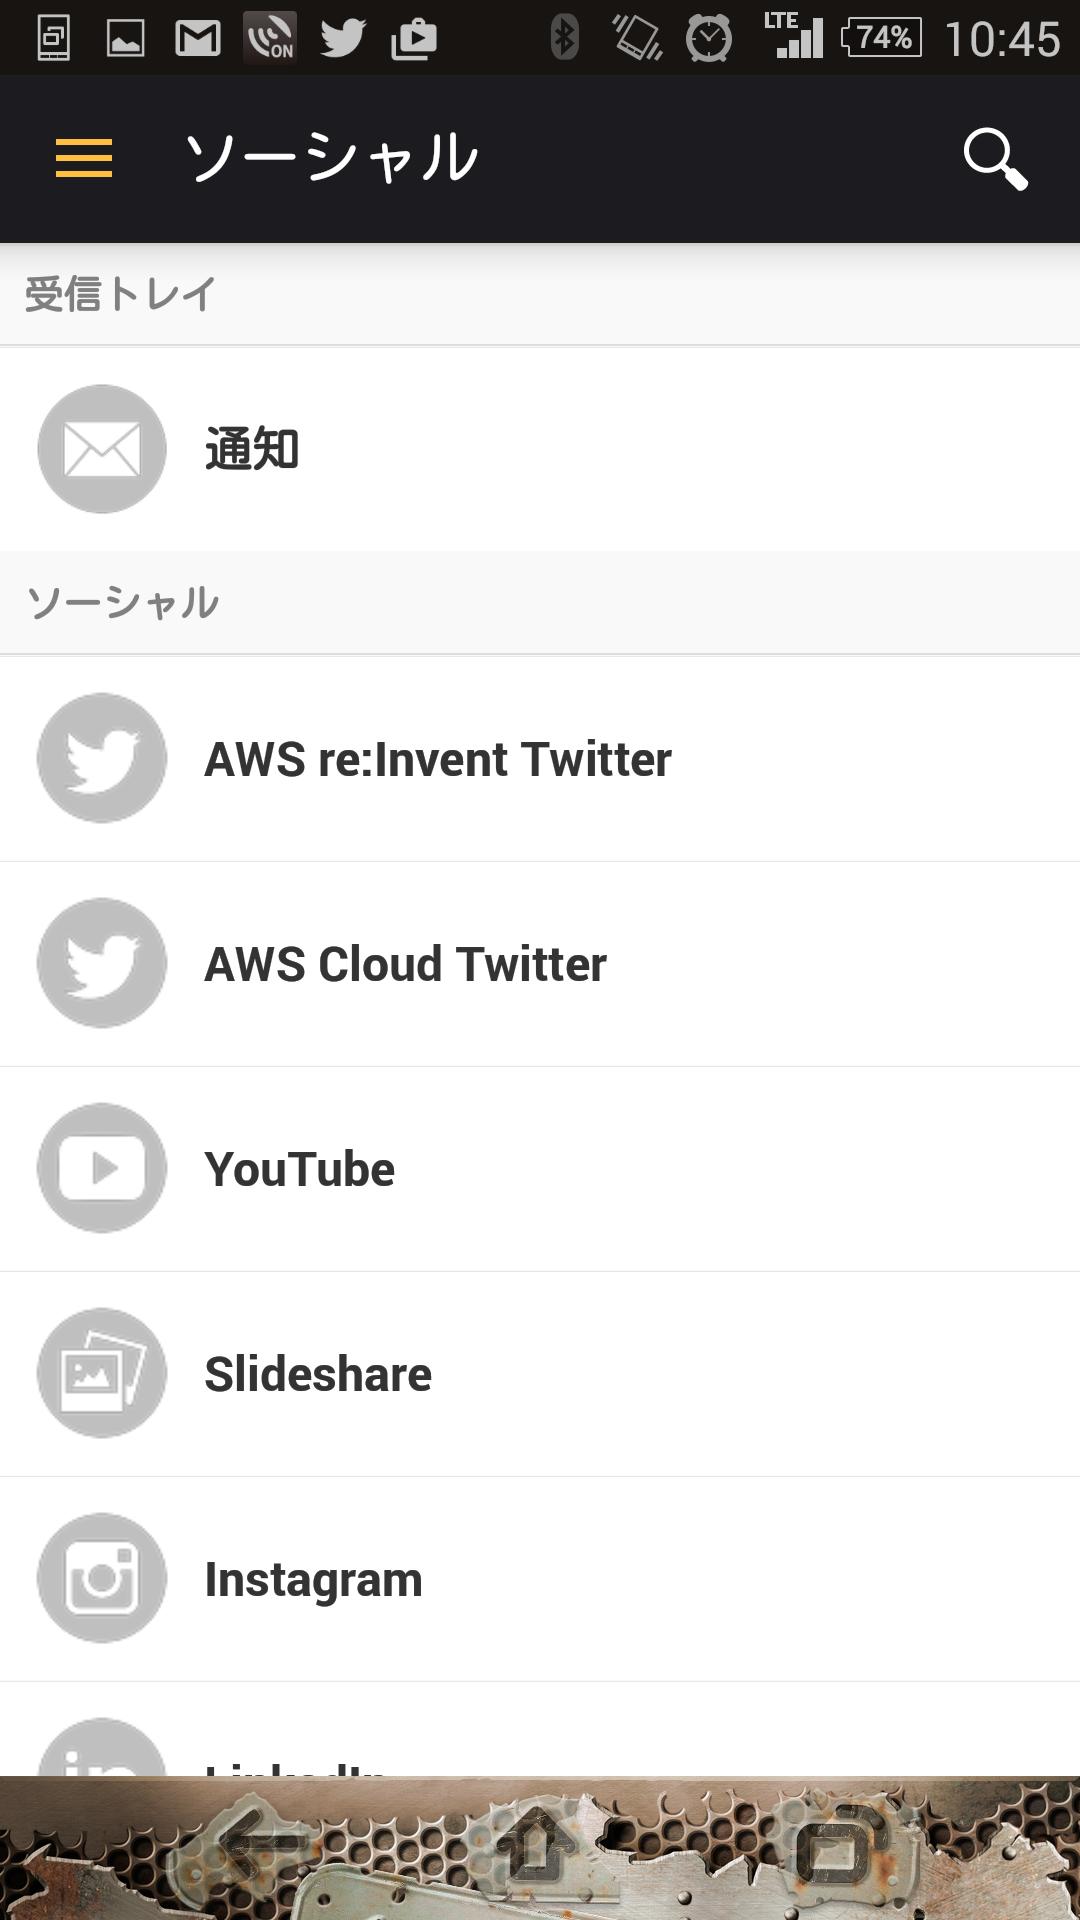 aws-reinvent-2015-event-app_22